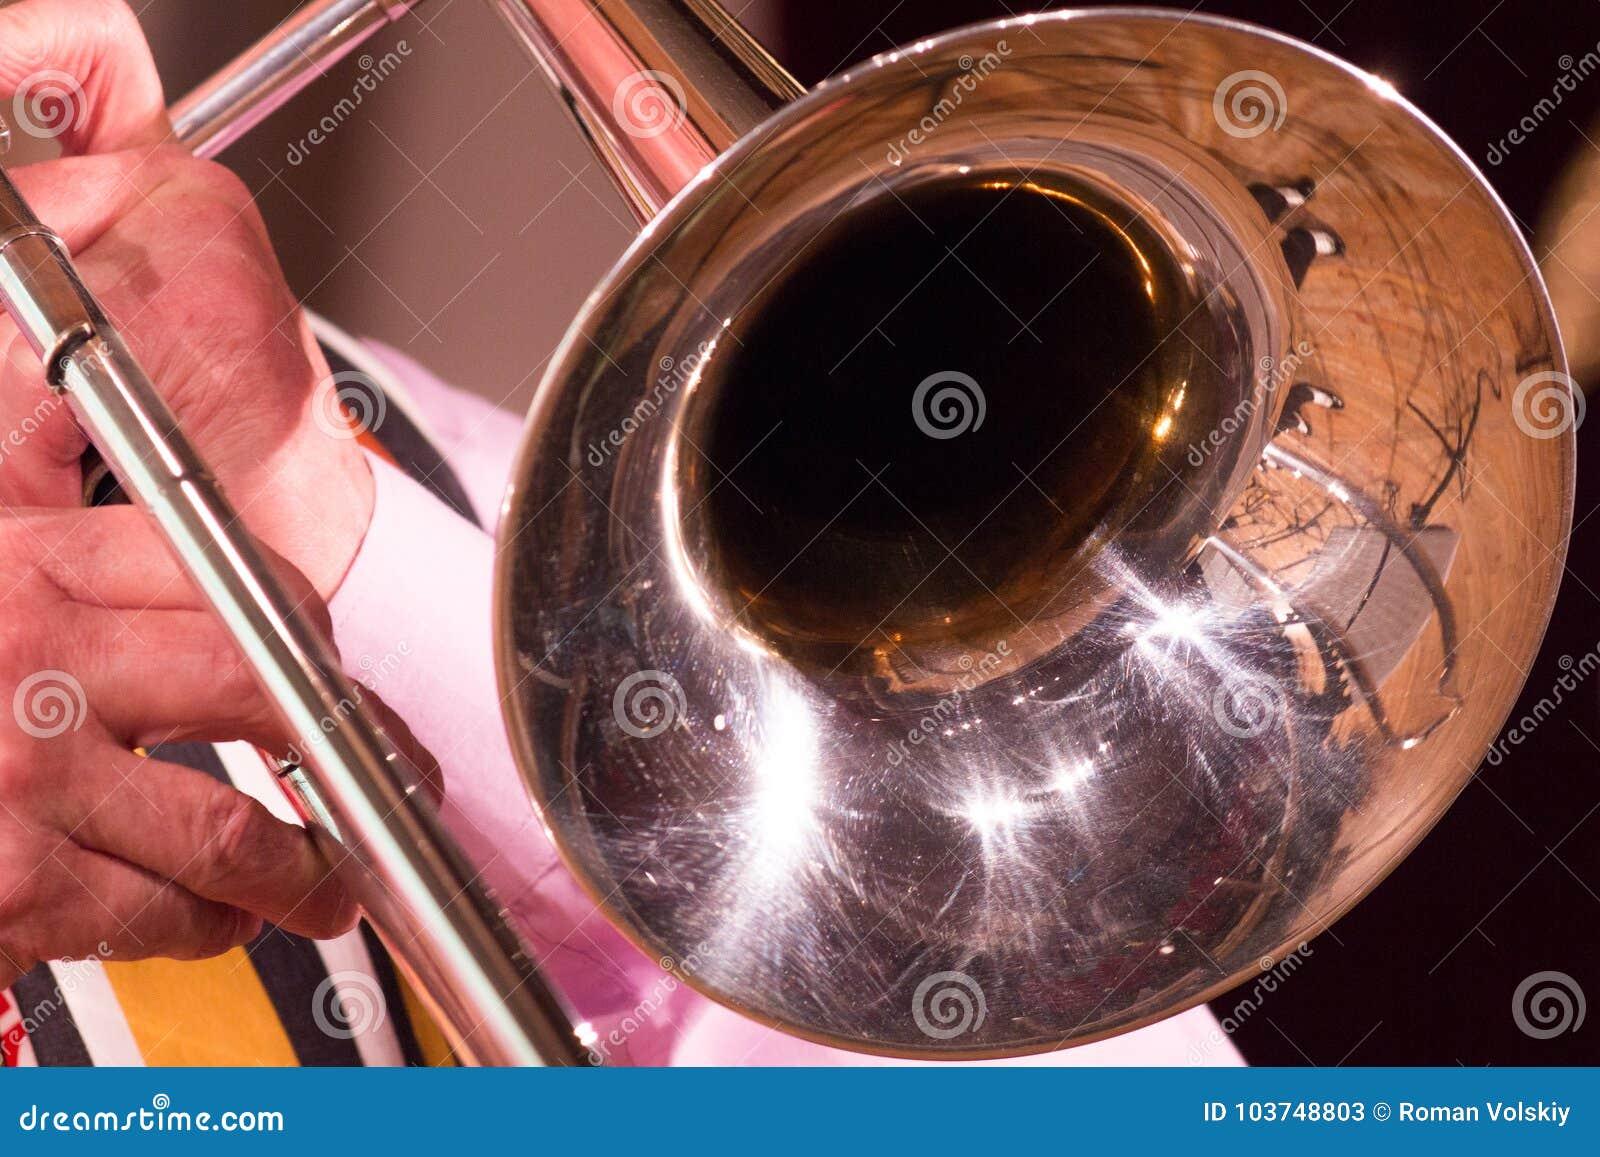 ноты для тромбона джаз